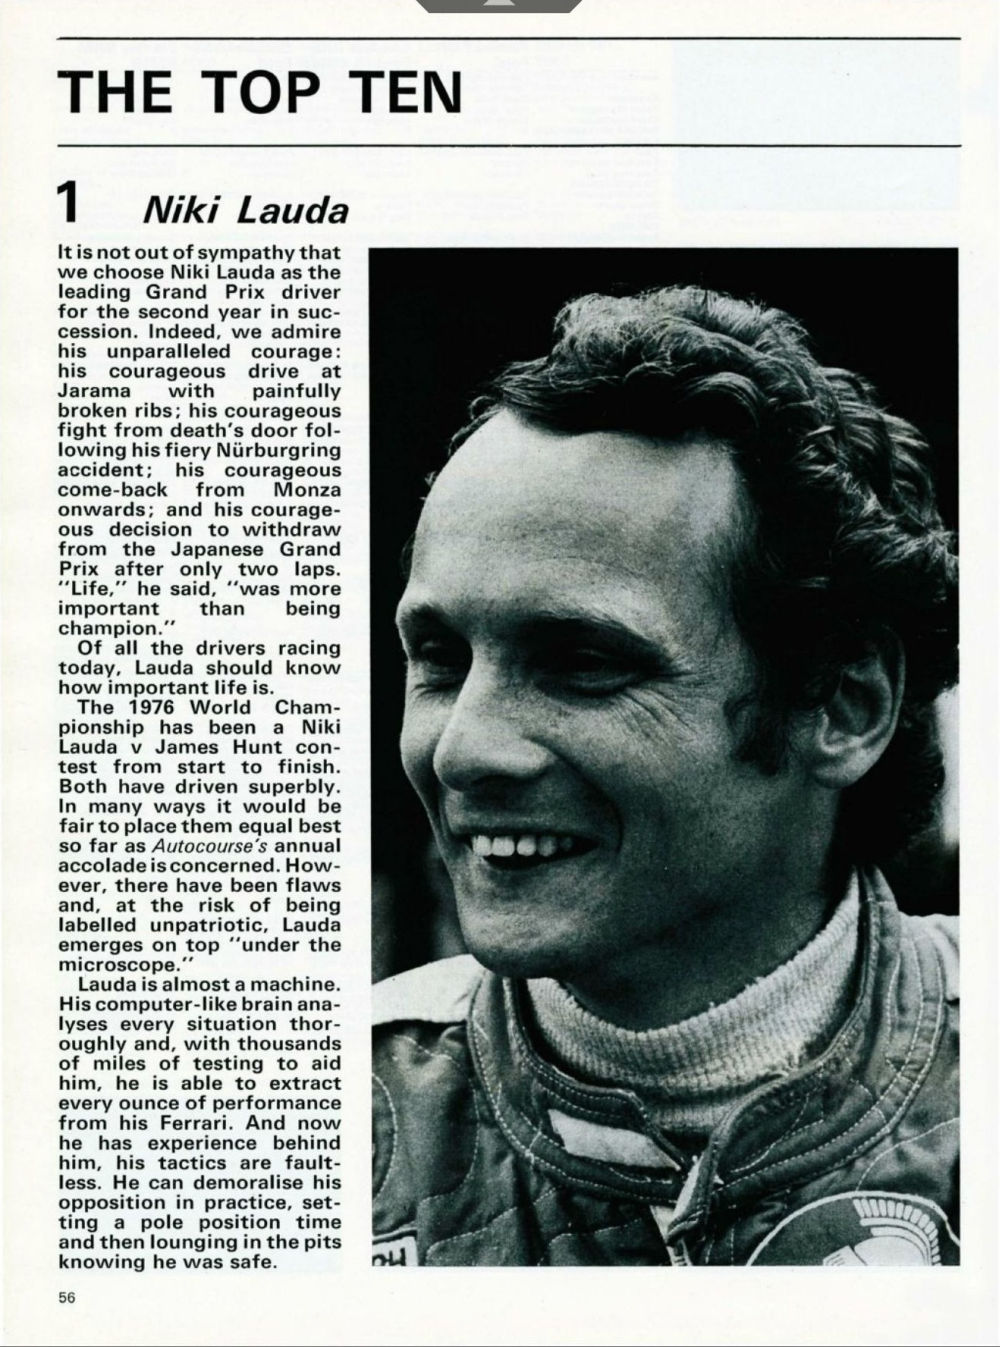 Formula 1 Niki Lauda - Omul care a sfidat moartea